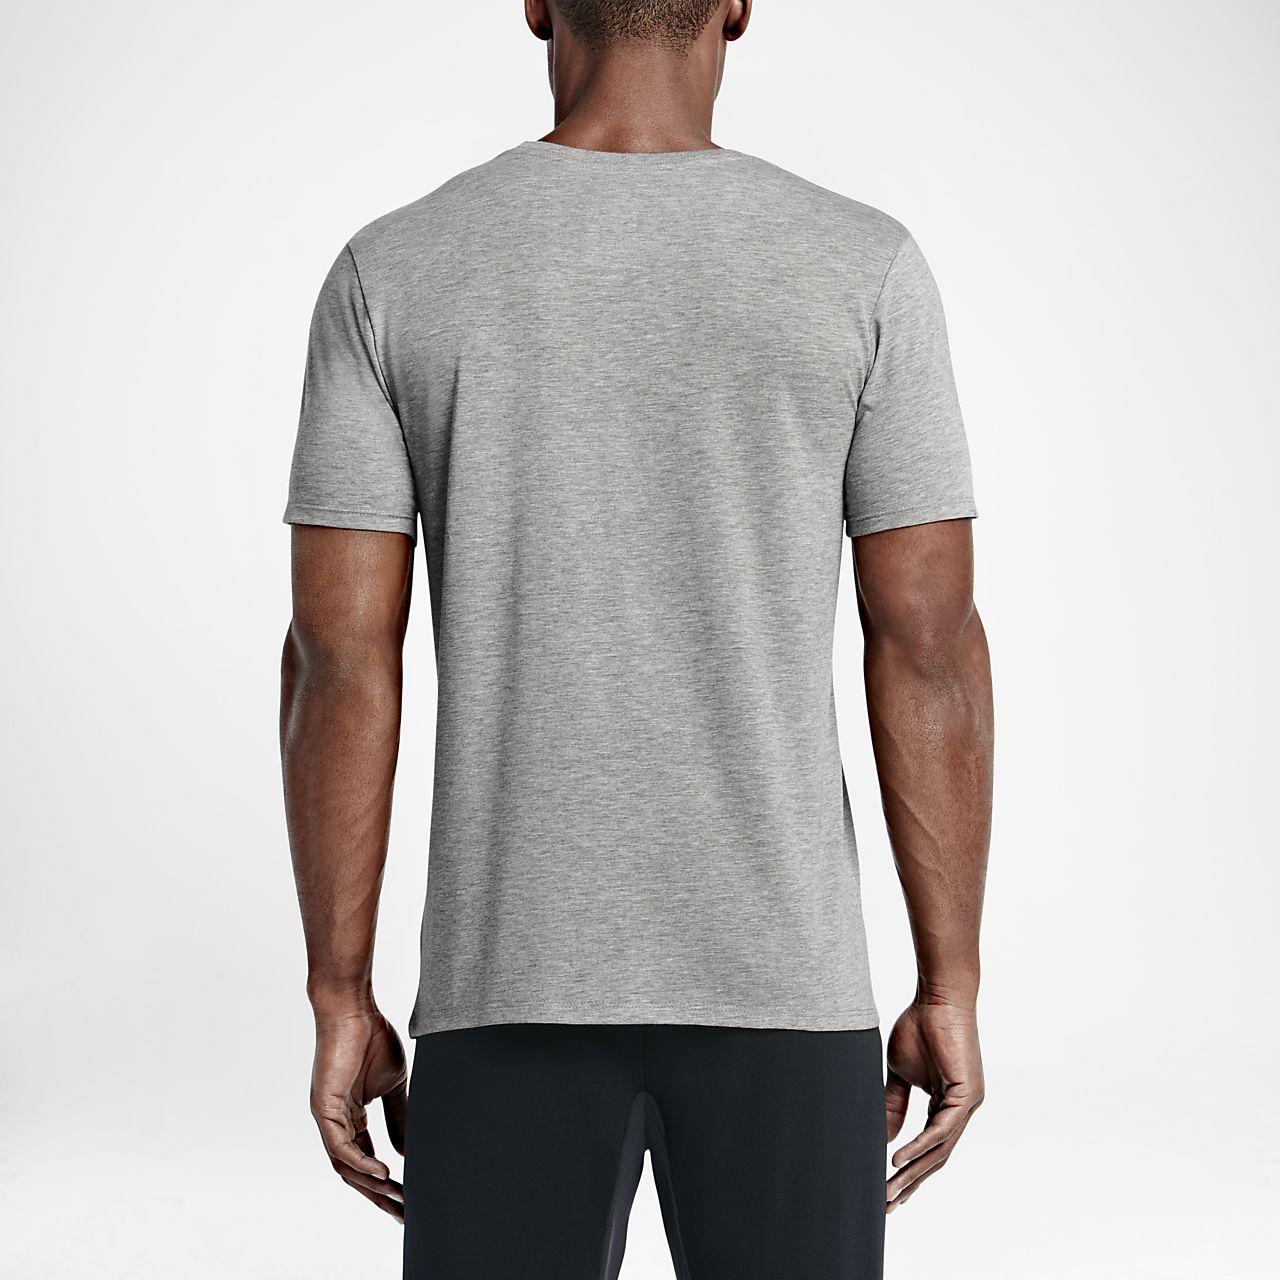 ... Nike Swoosh Athlete Men's T-Shirt